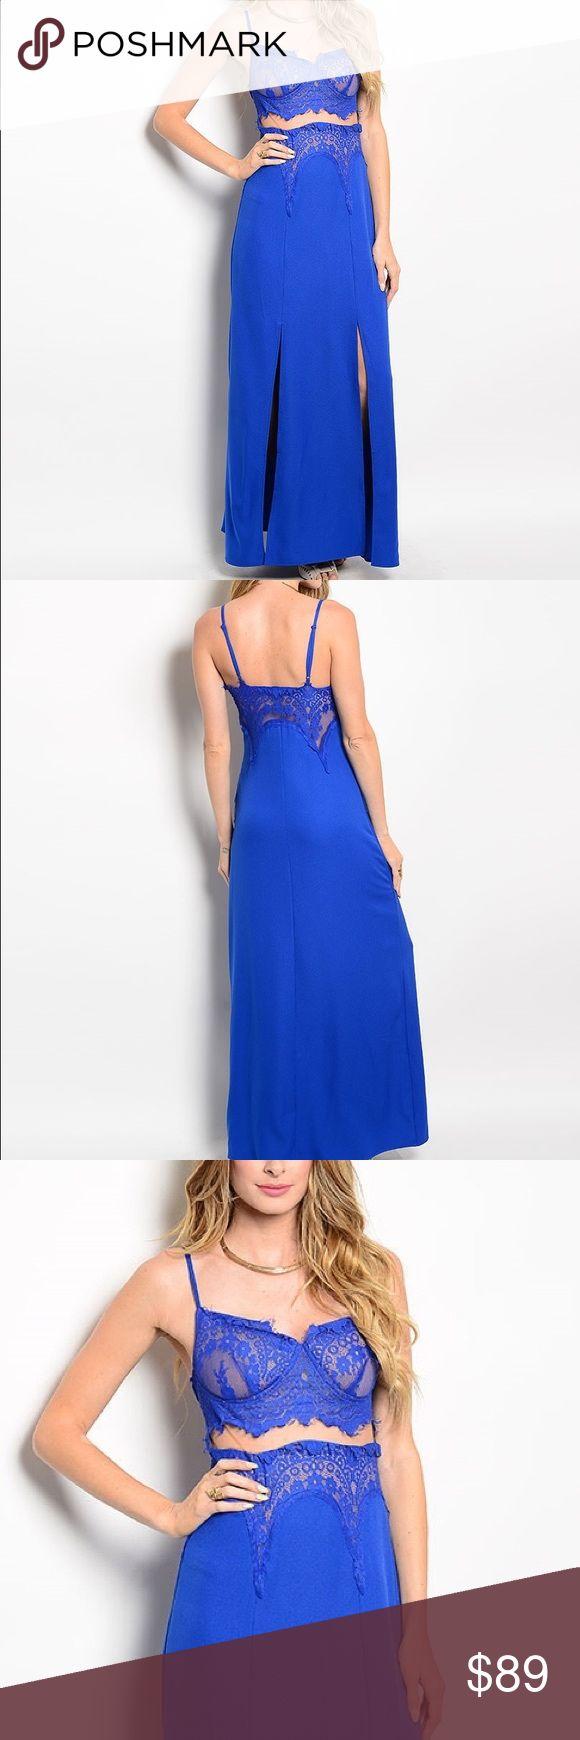 Blue Lace Bra Camisole Cutout Slit Maxi Dress Sexy, stunning dress features slit hem. Dresses Maxi